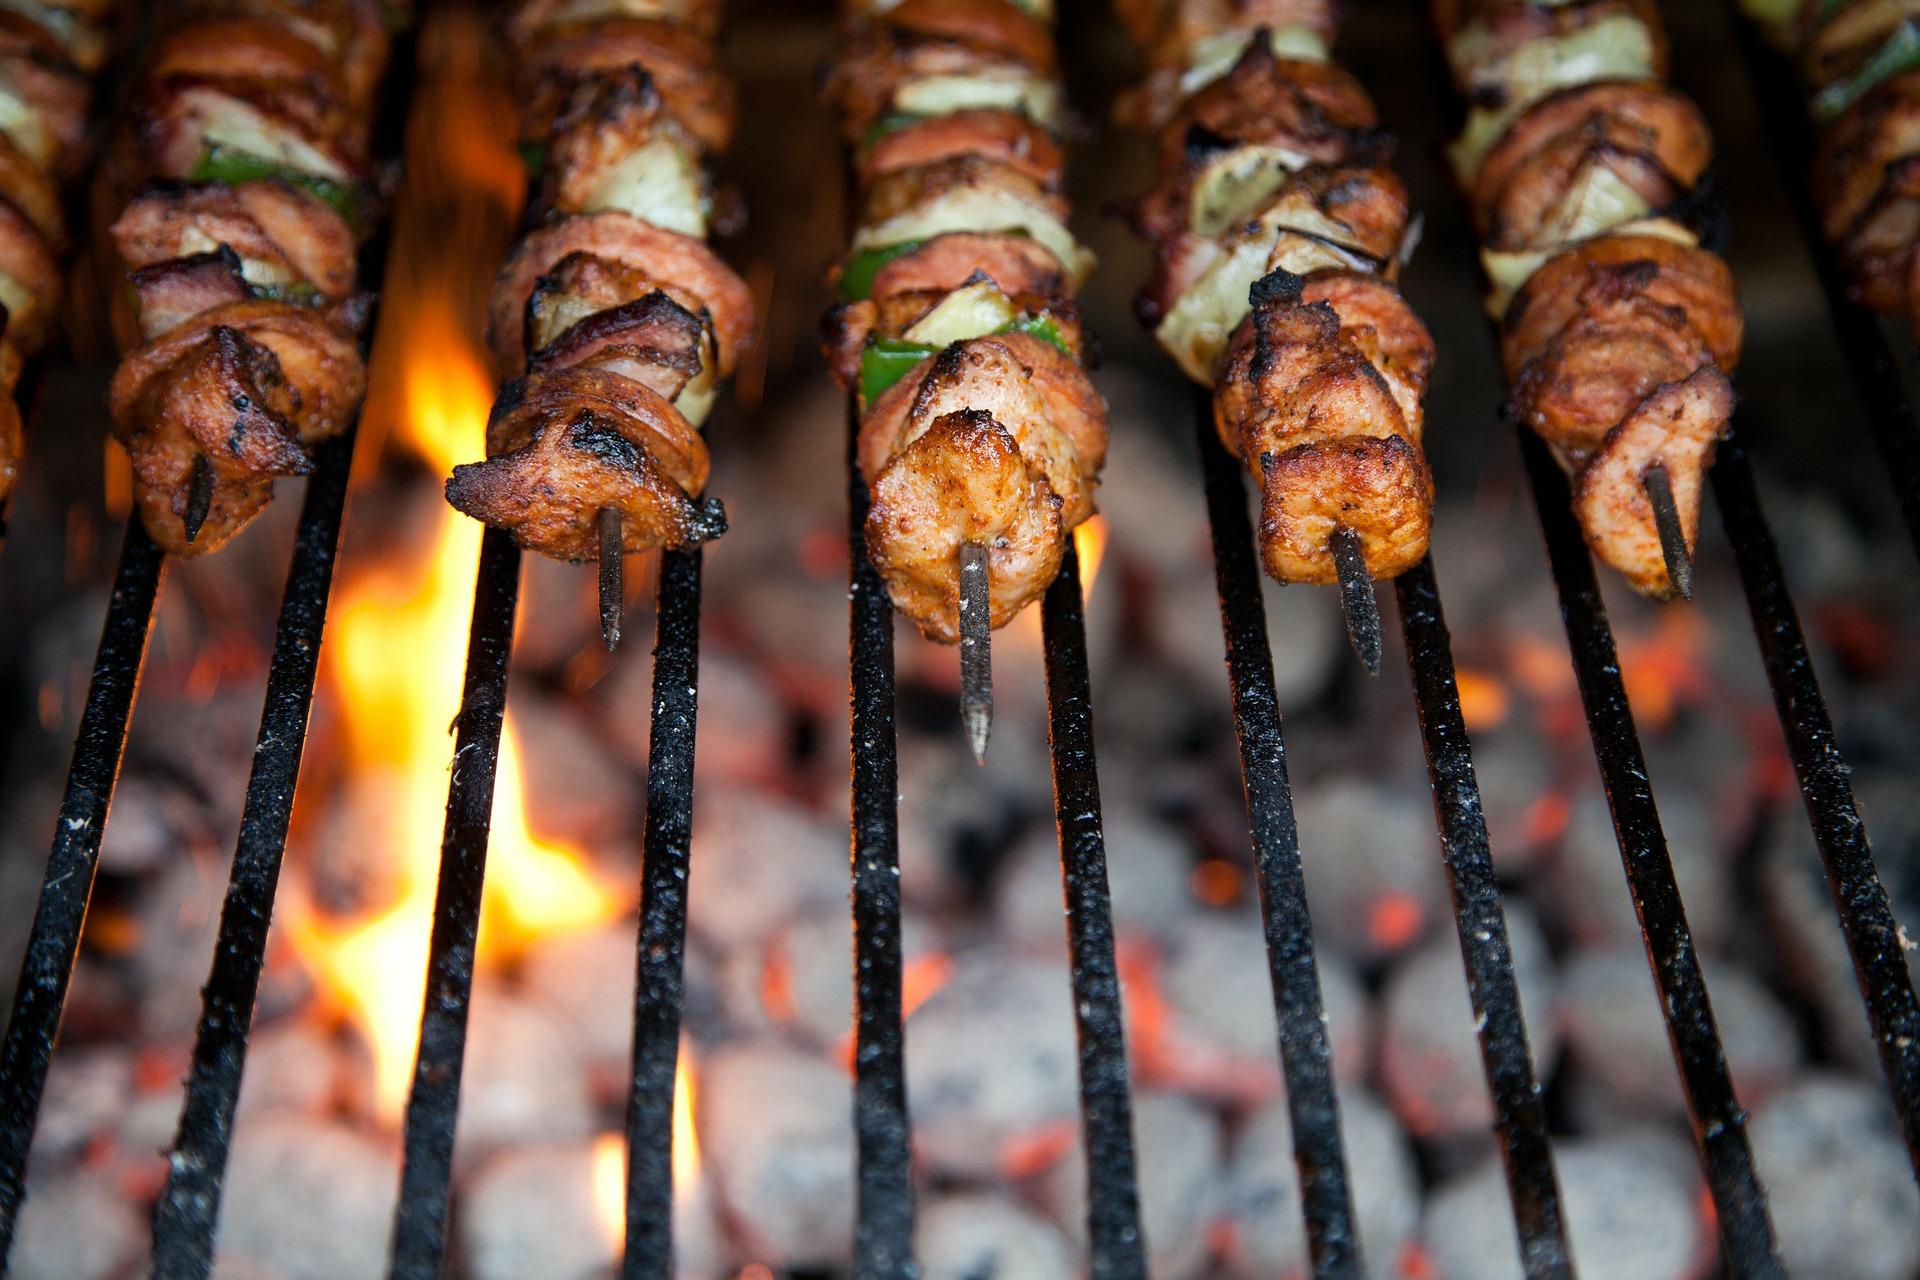 barbecue-84671_1920.jpg